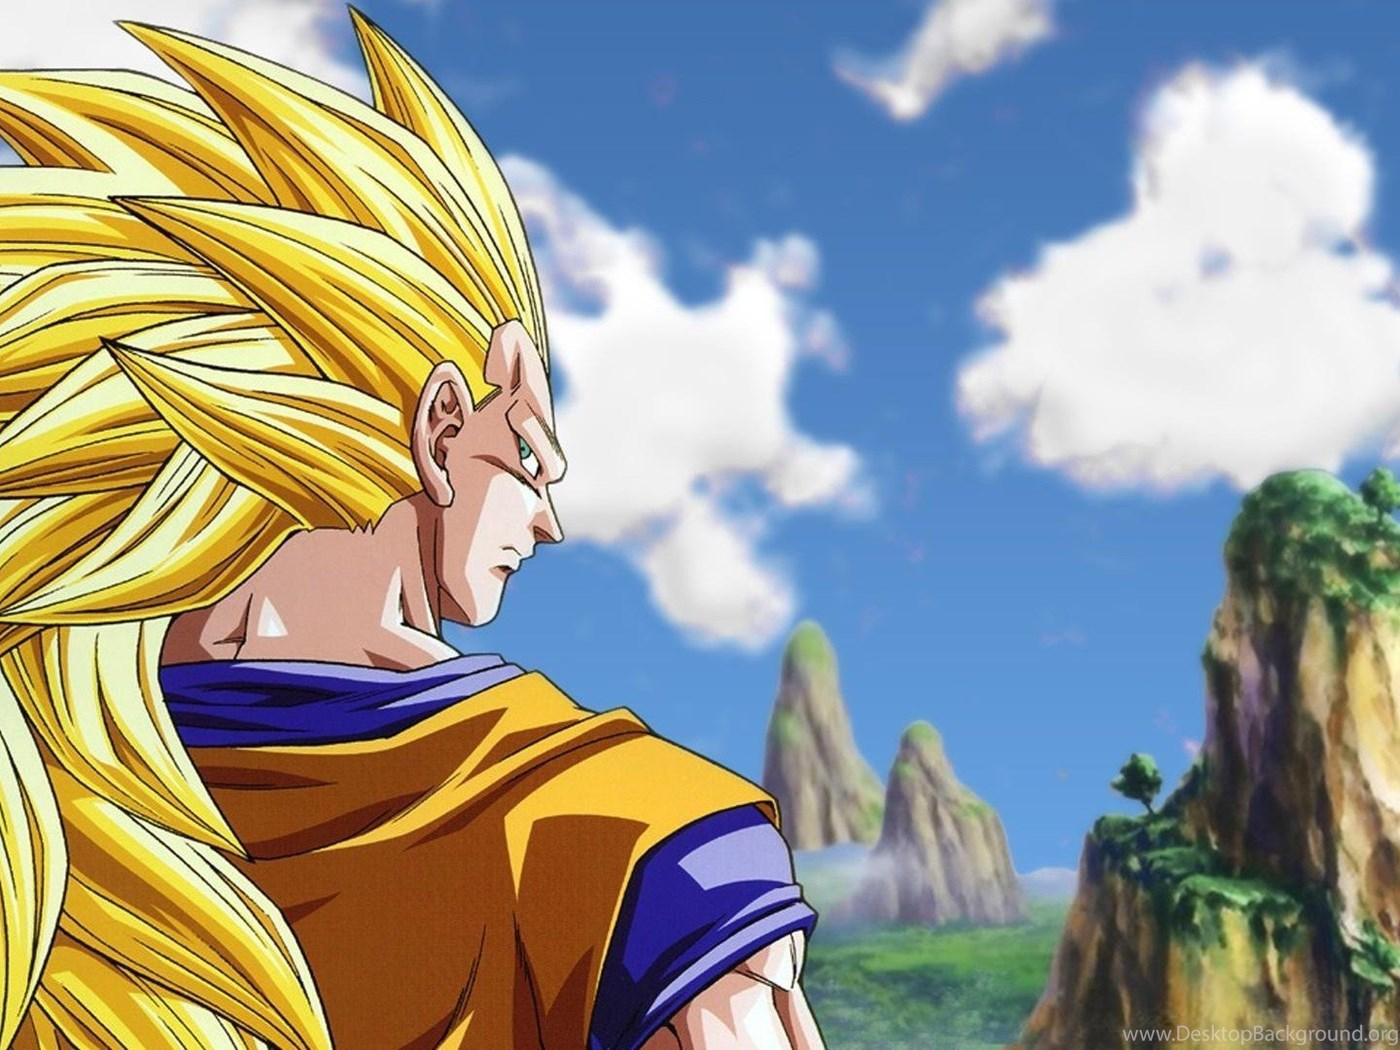 Hd Super Saiyan 3 Goku Dragon Ball Z Wallpapers Full Size